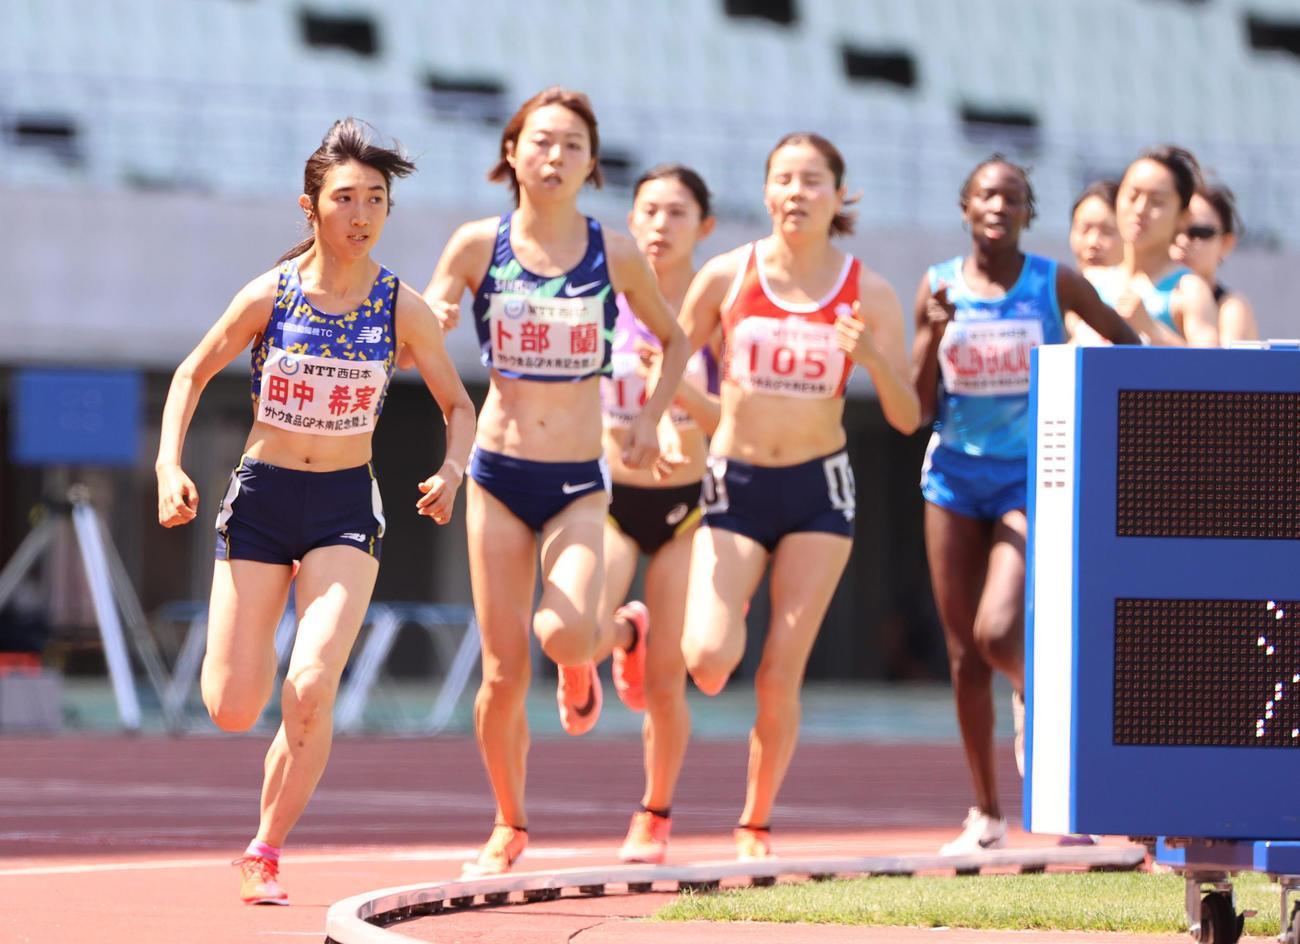 木南道孝記念陸上競技大会 女子1500メートル 4分10秒06で優勝する田中希実(撮影・清水貴仁)